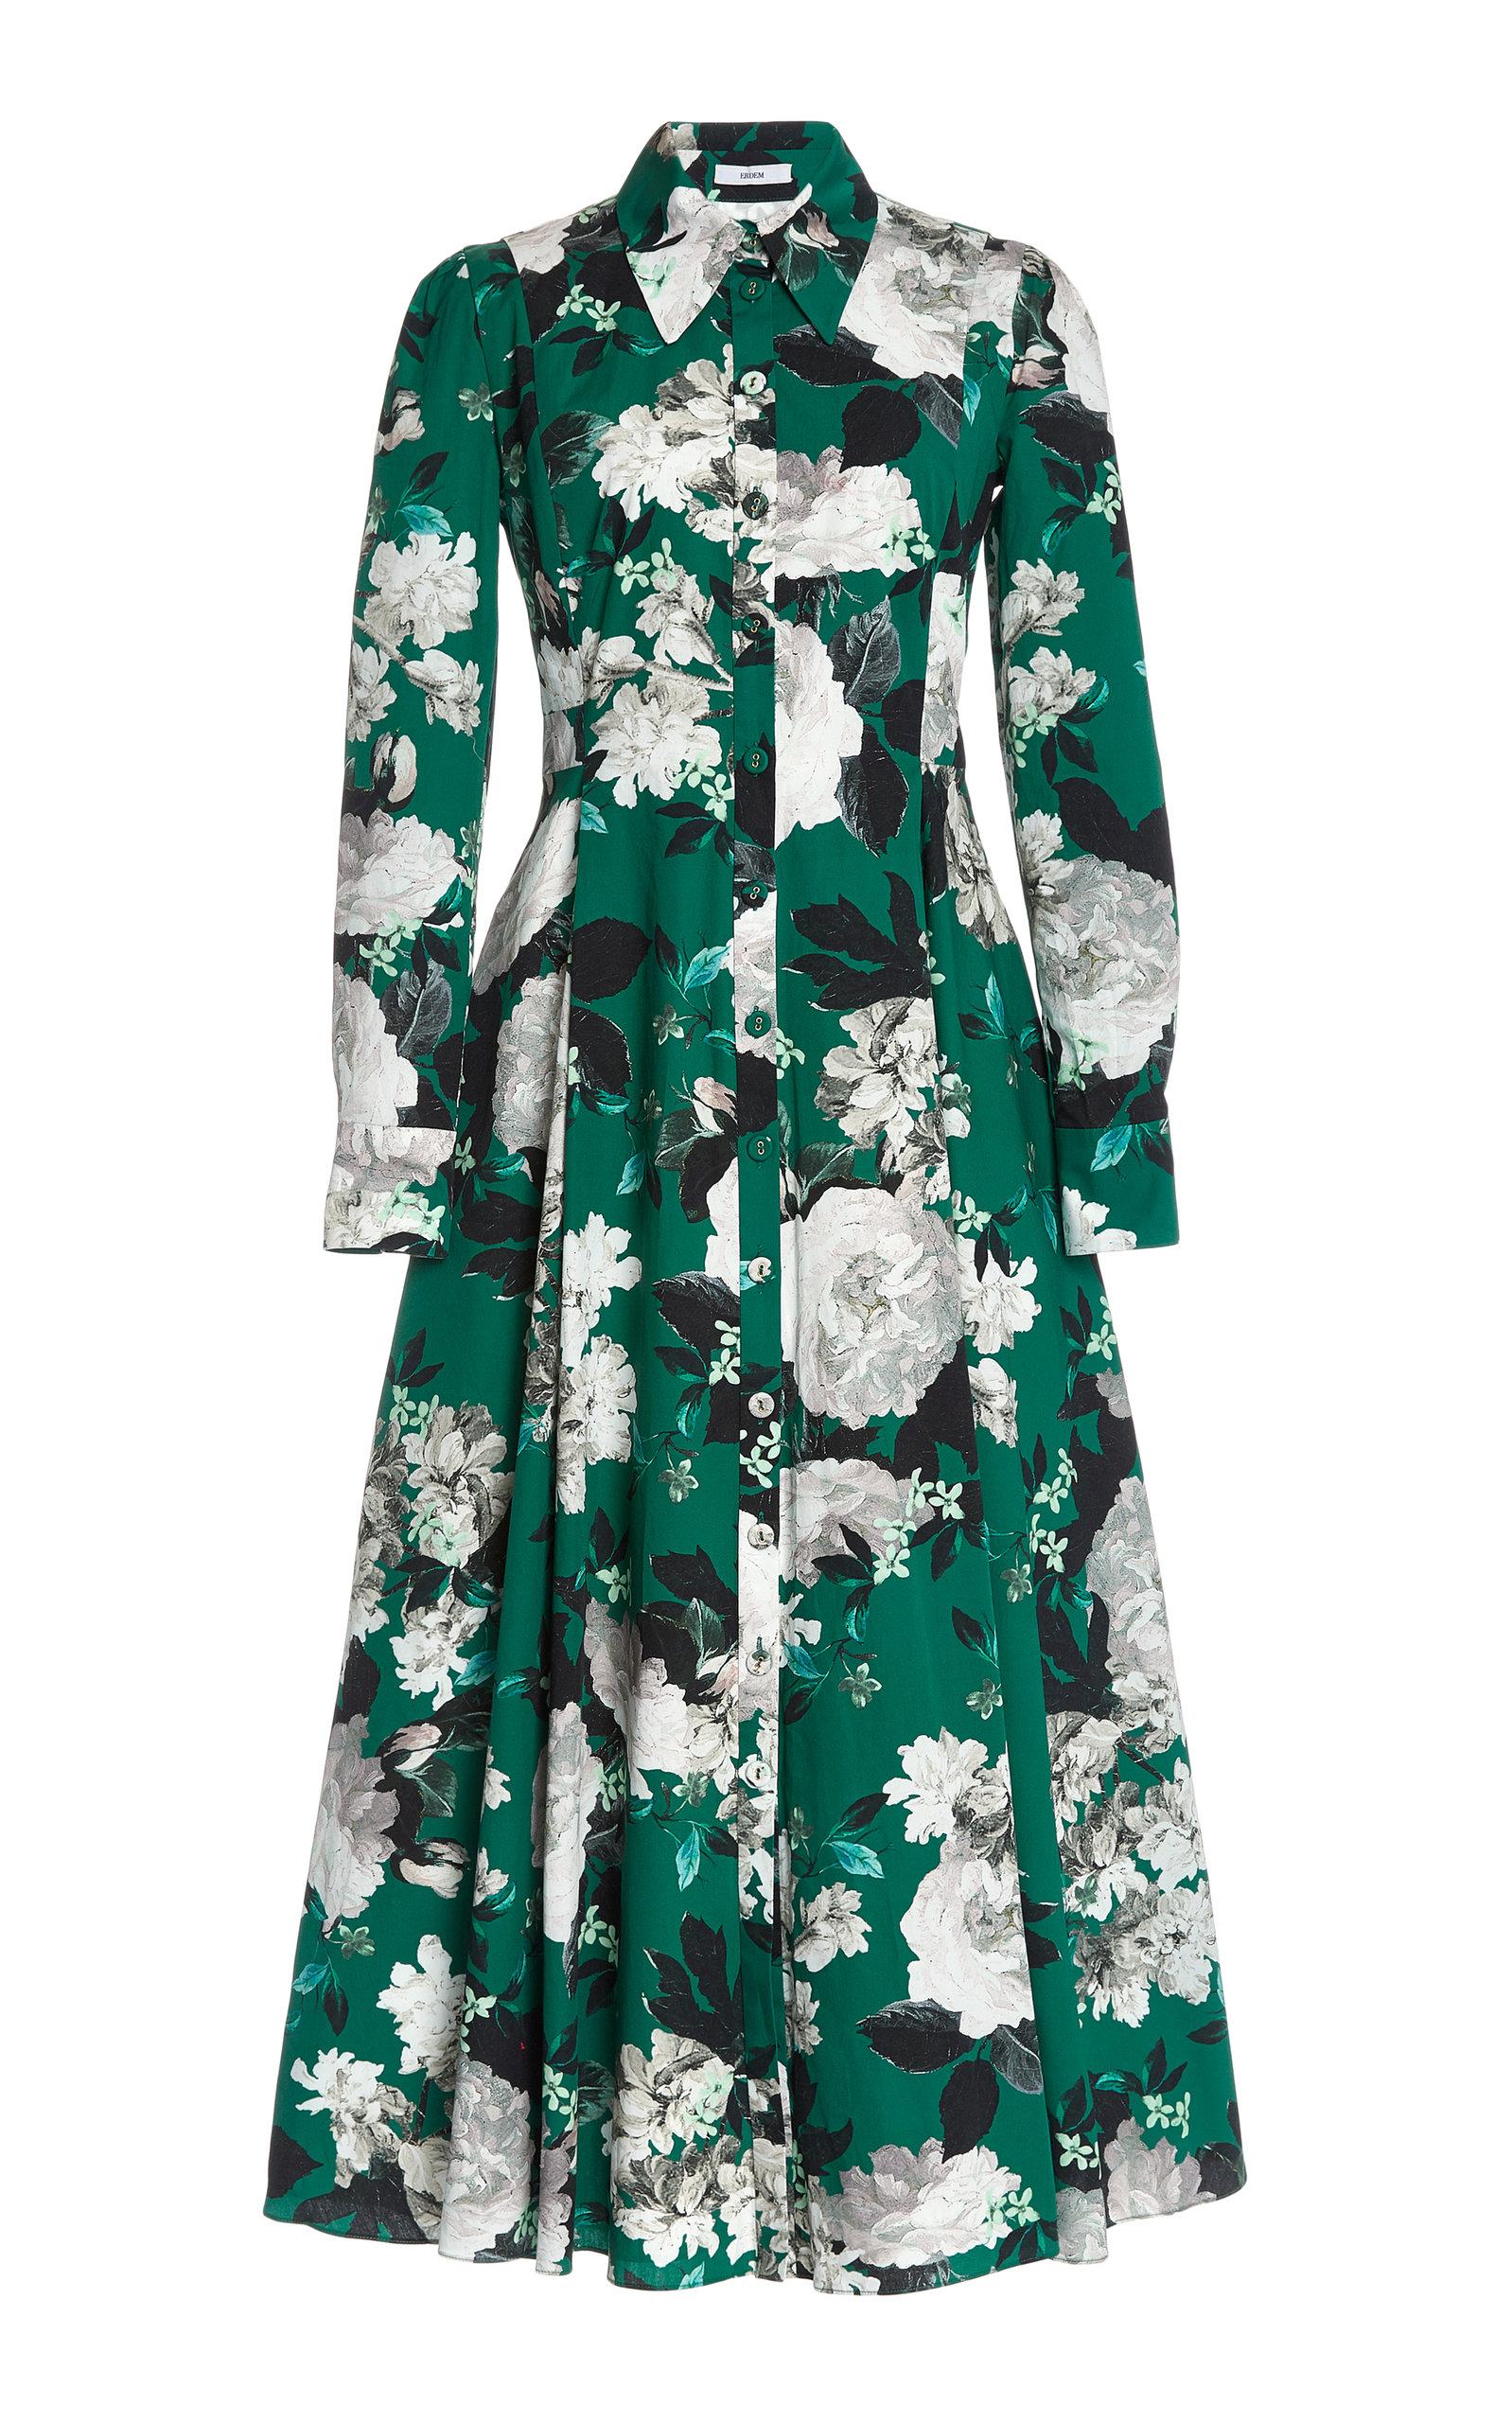 Buy Erdem Josianna Floral-Print Cotton Shirt Dress online, shop Erdem at the best price